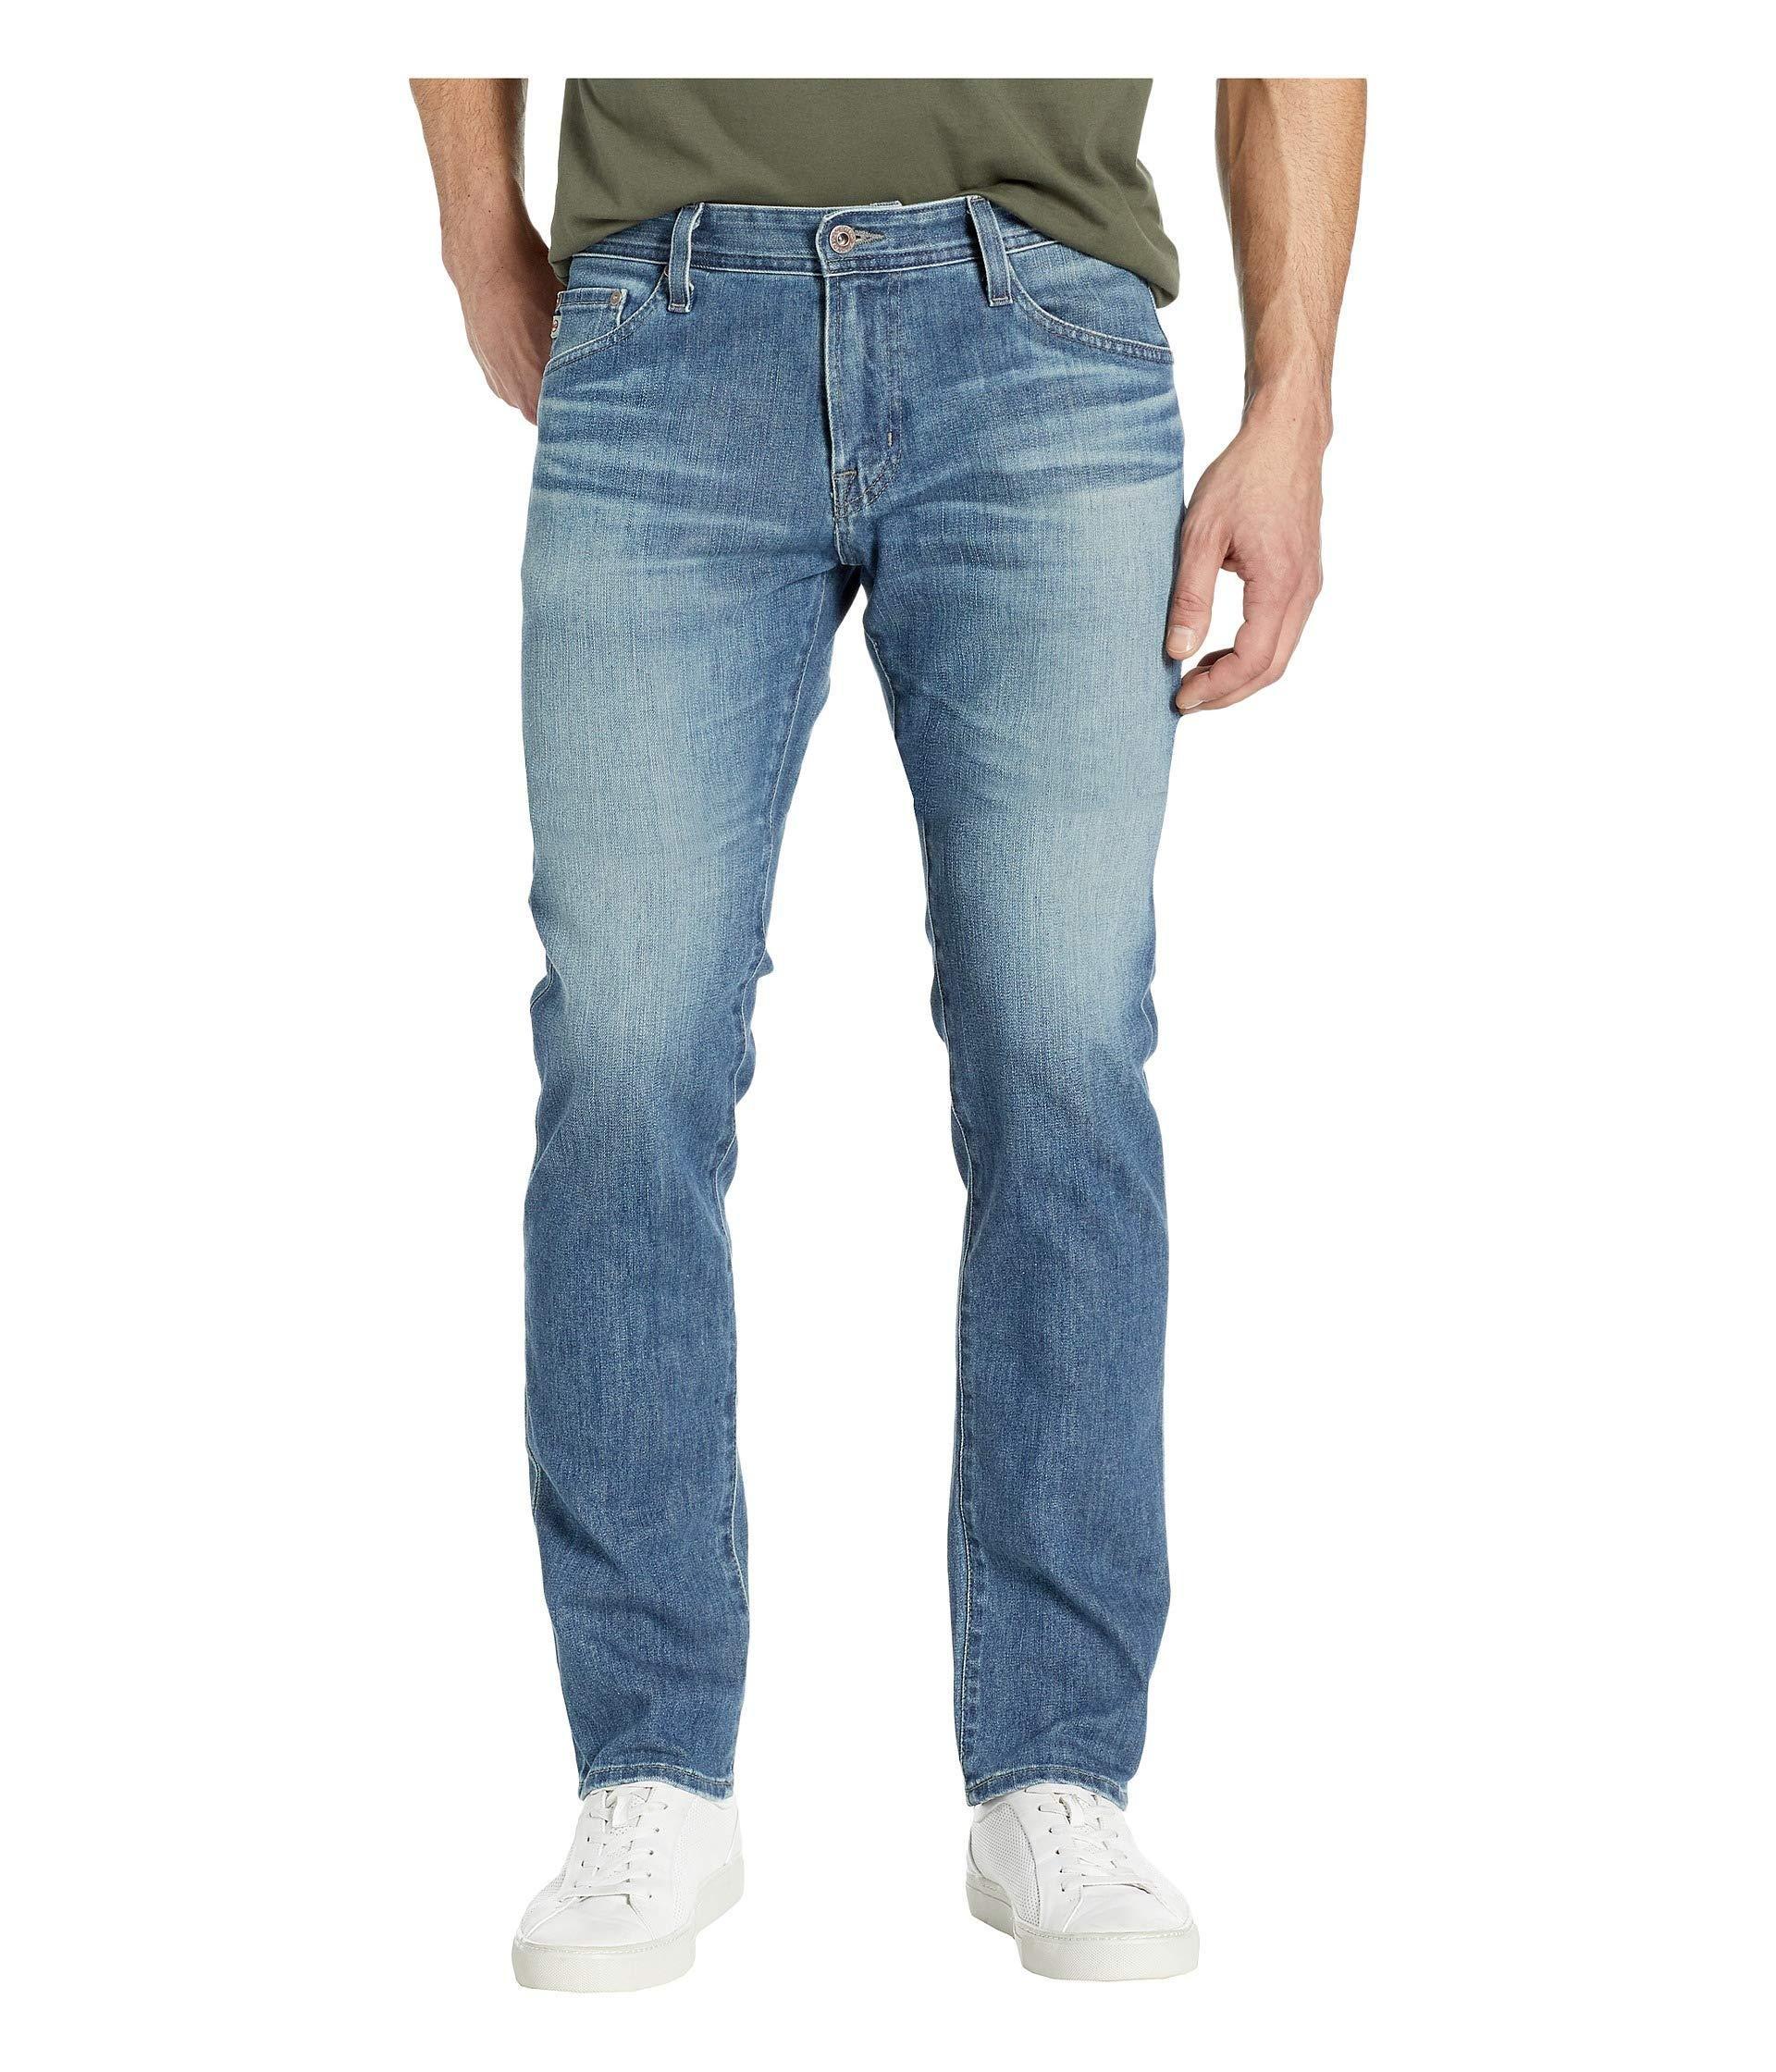 ffb837e1 Lyst - AG Jeans Tellis Modern Slim Leg Denim Jeans In Aperture ...